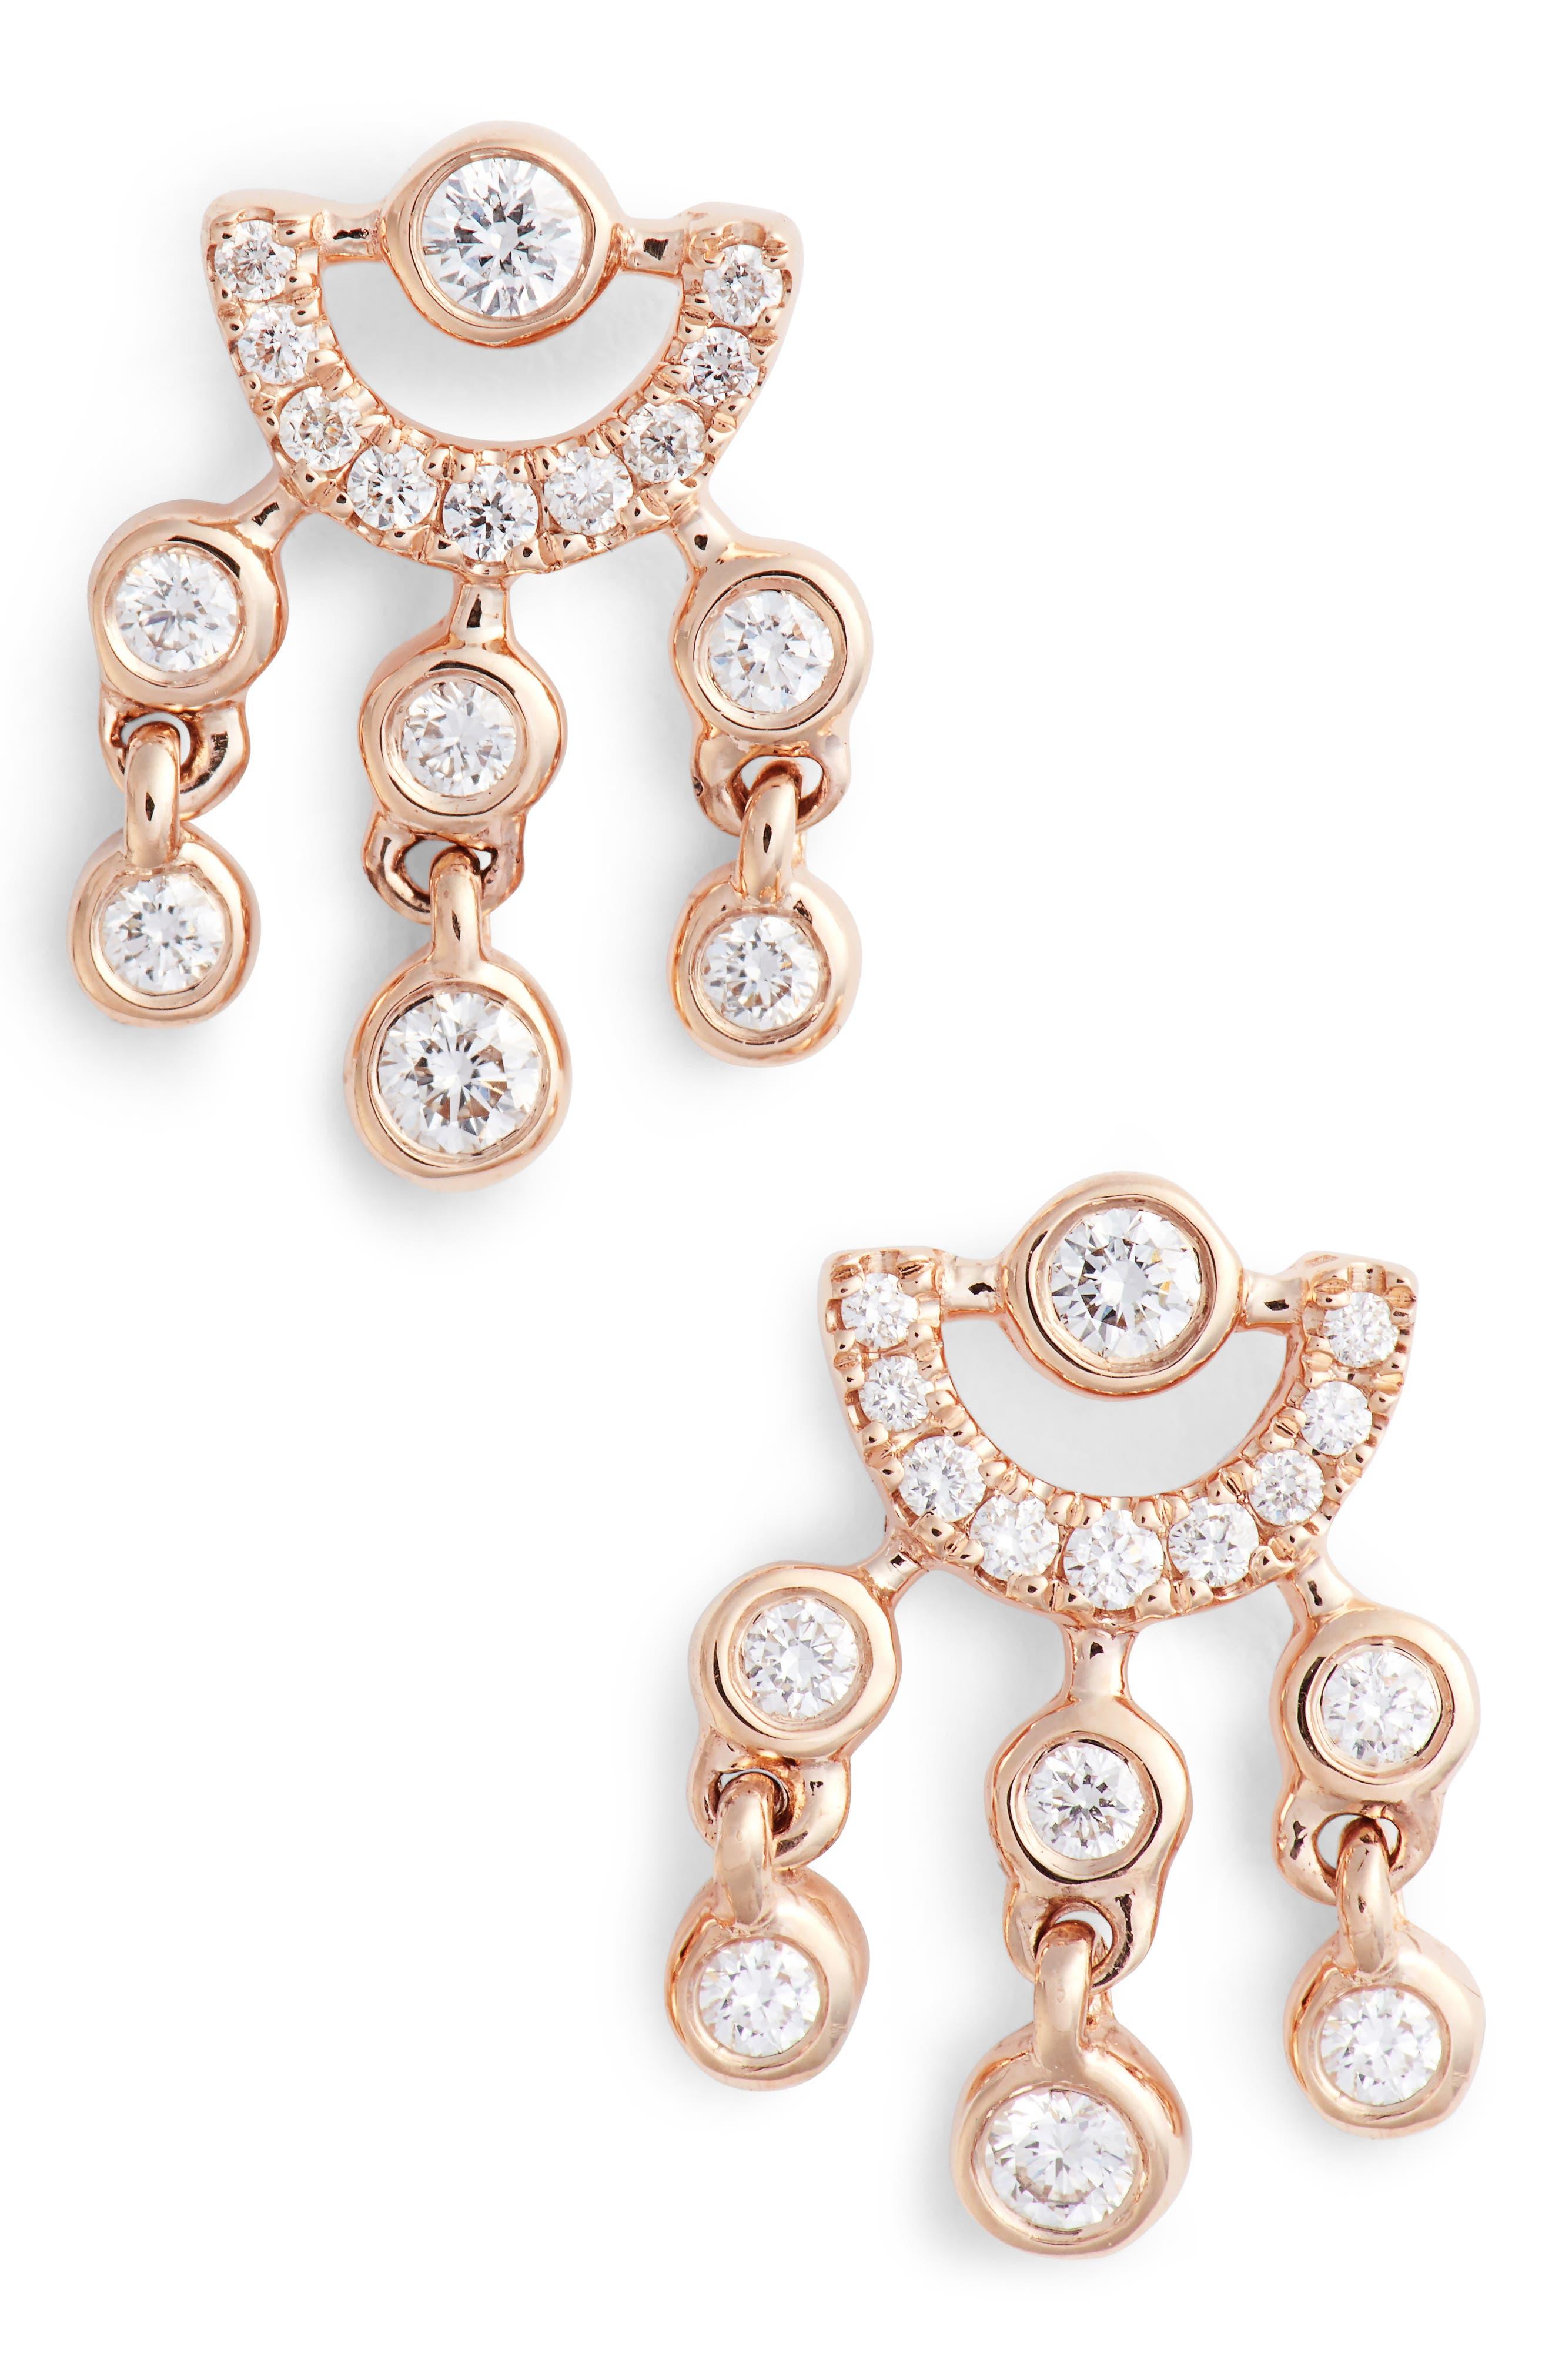 Lulu Jack Diamond Drop Earrings,                             Main thumbnail 1, color,                             ROSE GOLD